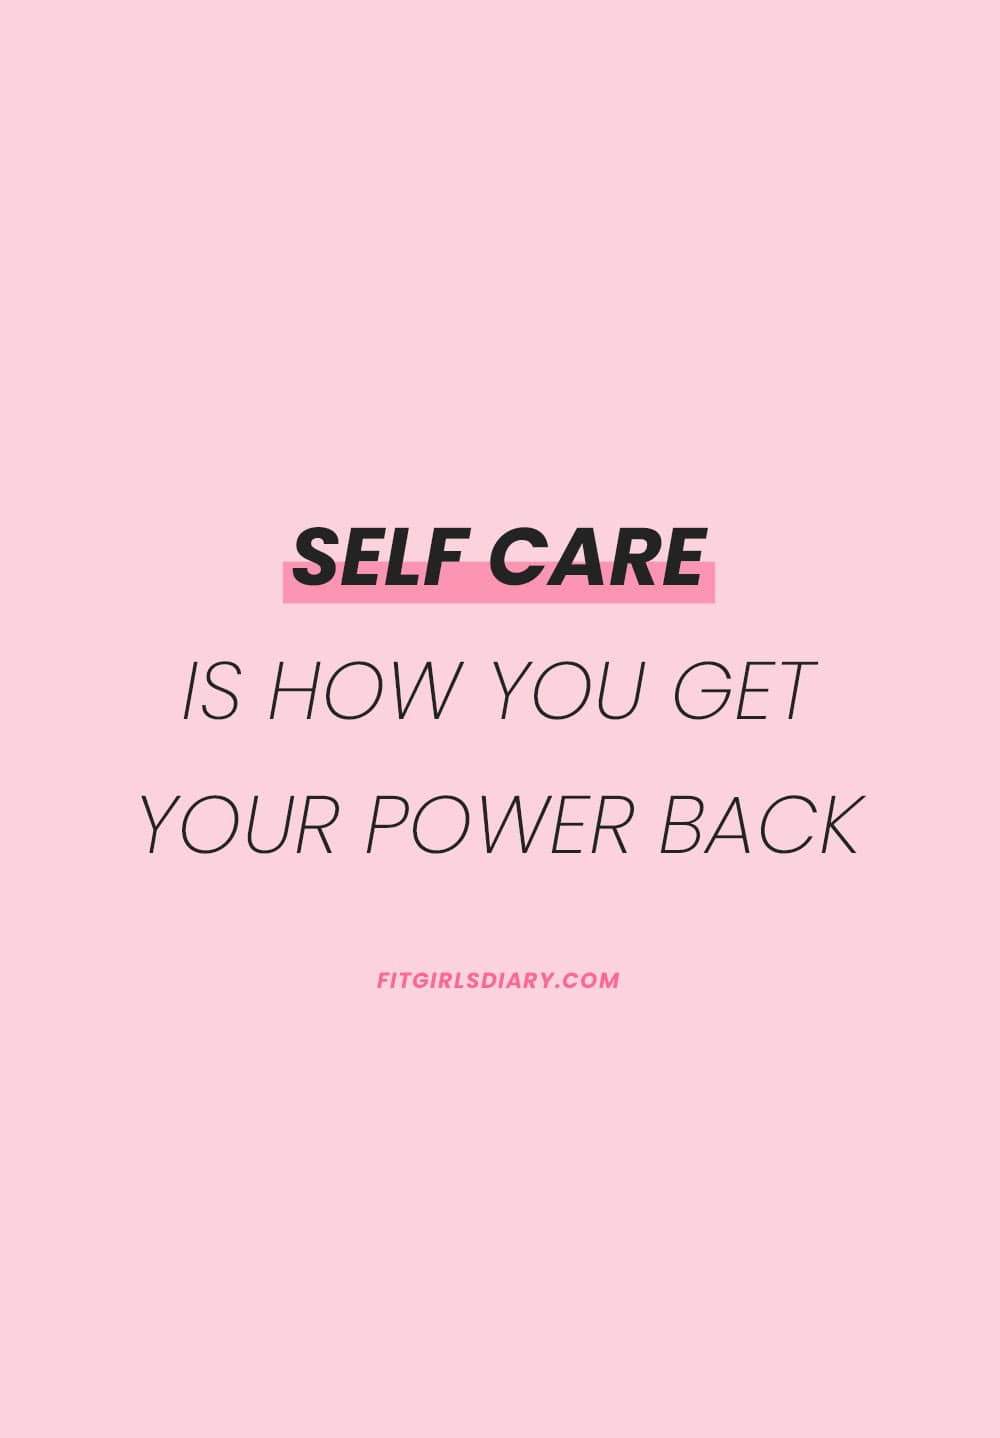 self care quotes - self care routine